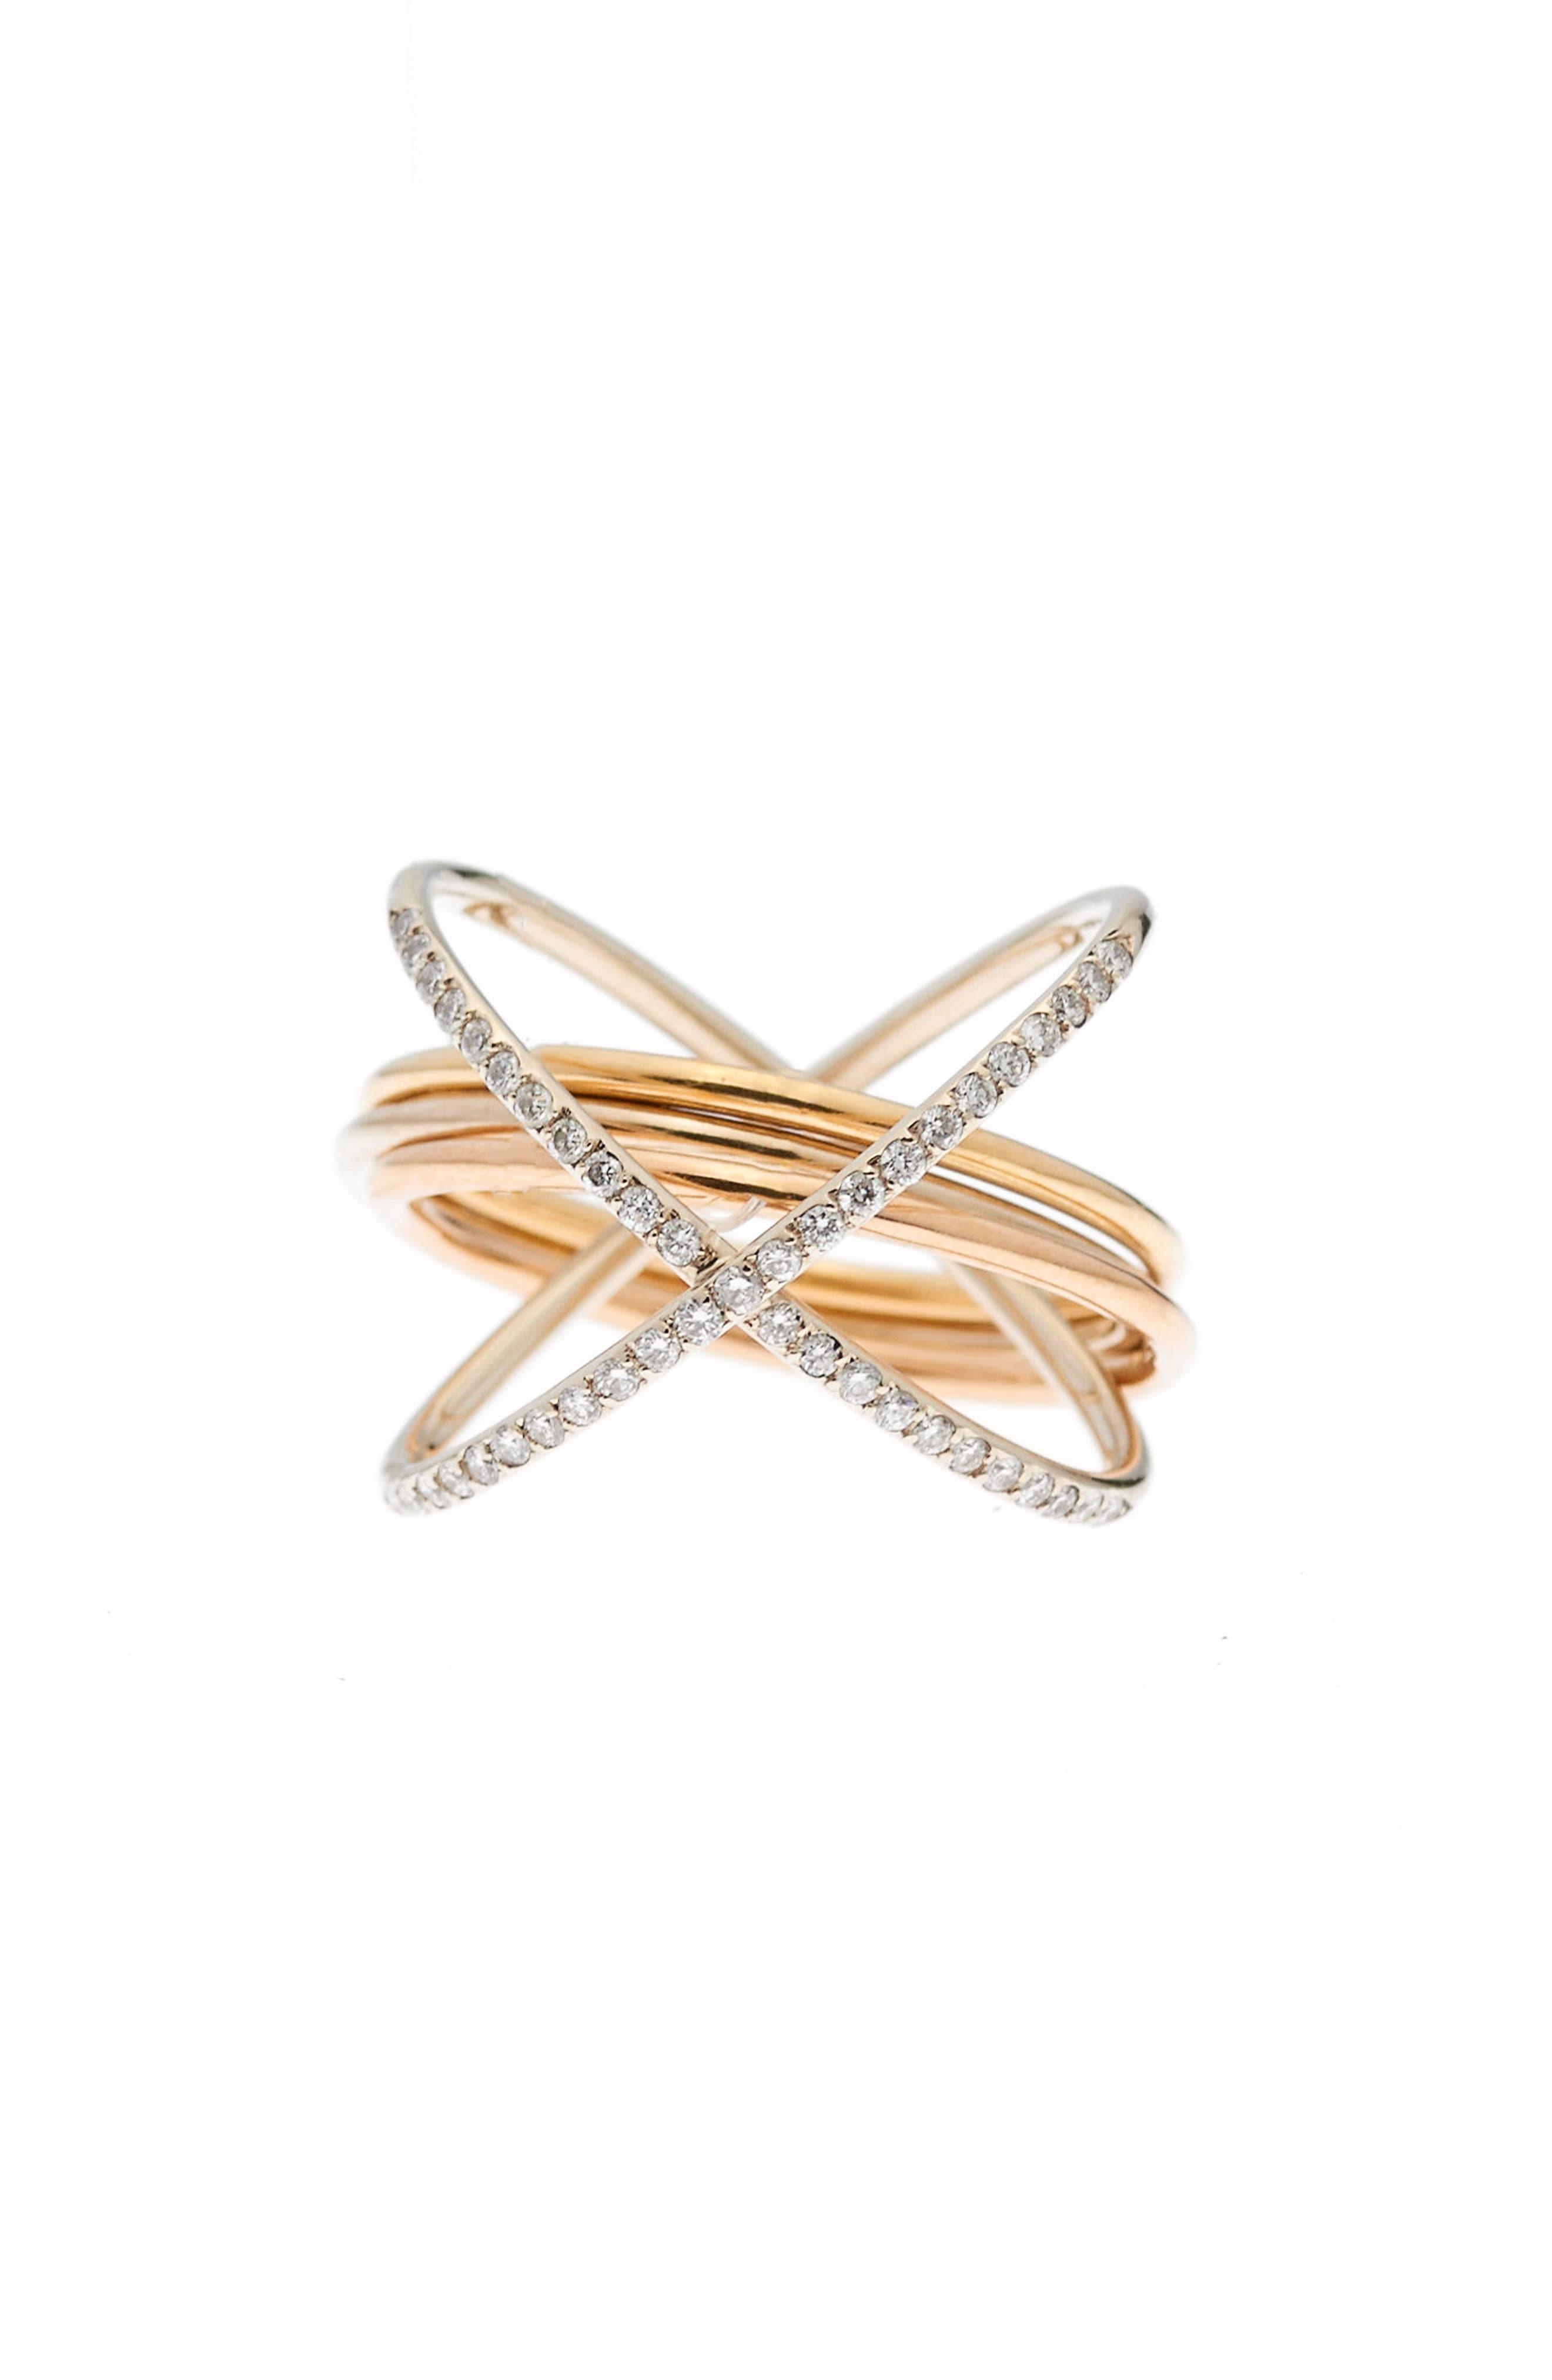 XXO Diamond Ring,                             Main thumbnail 1, color,                             YELLOW ROSE WHITE GOLD